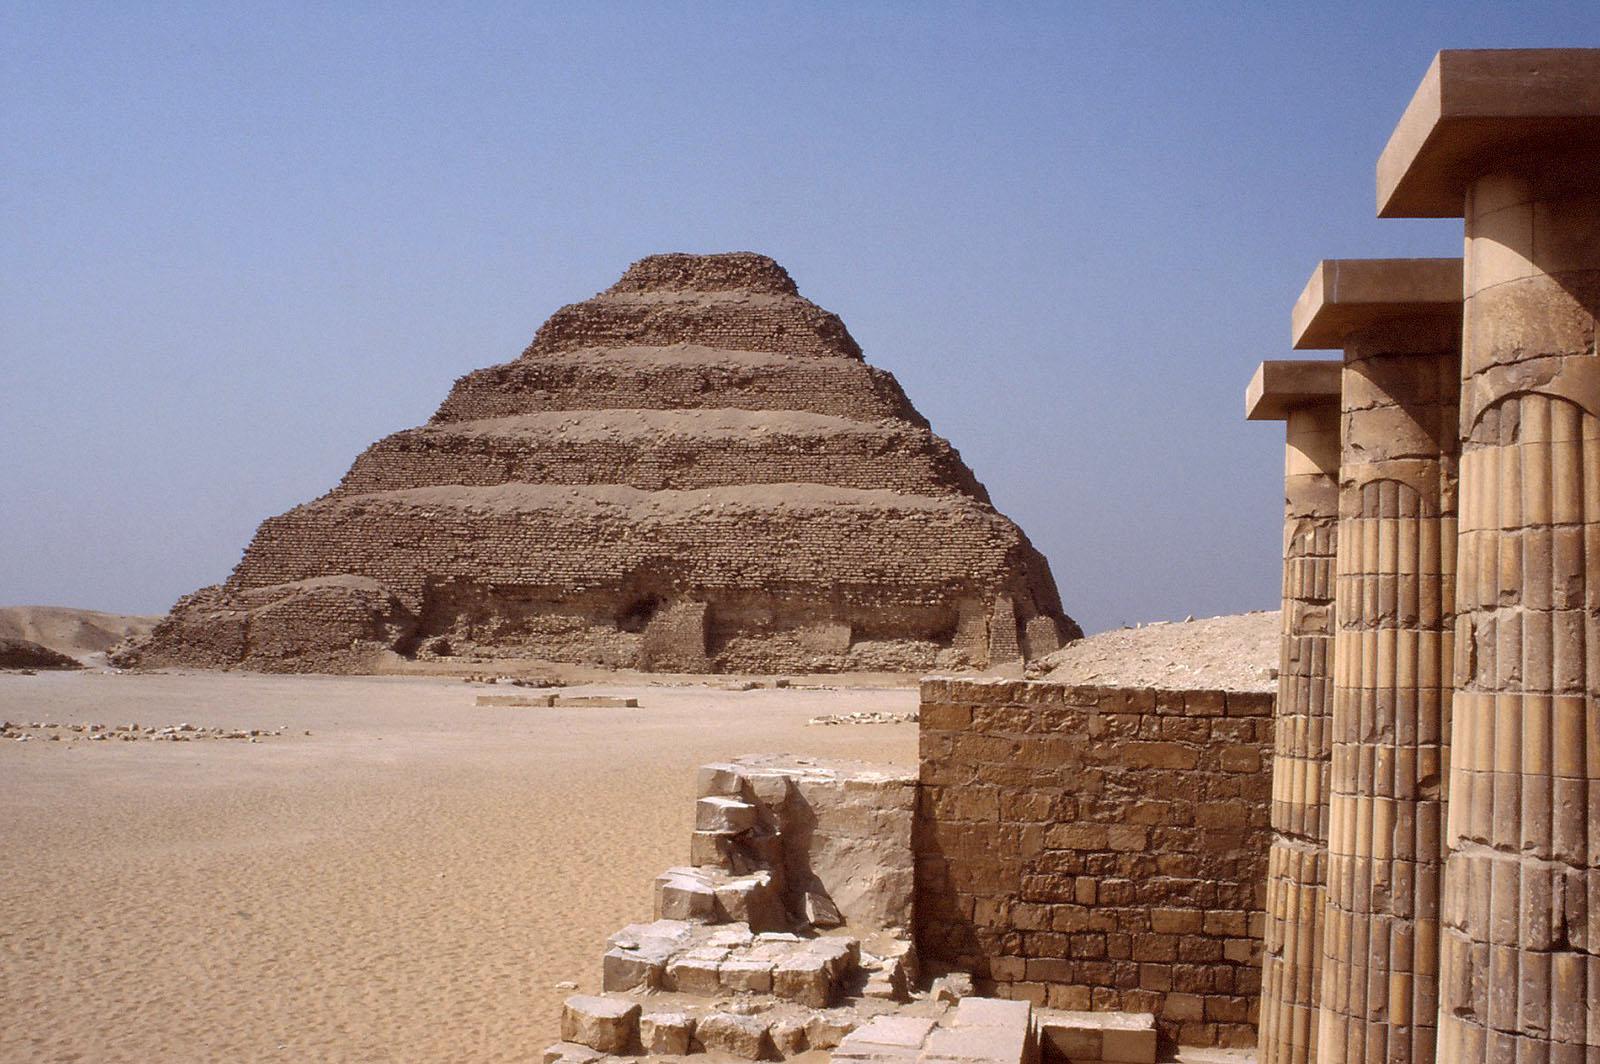 egypt pyramids sphinx inside - photo #12